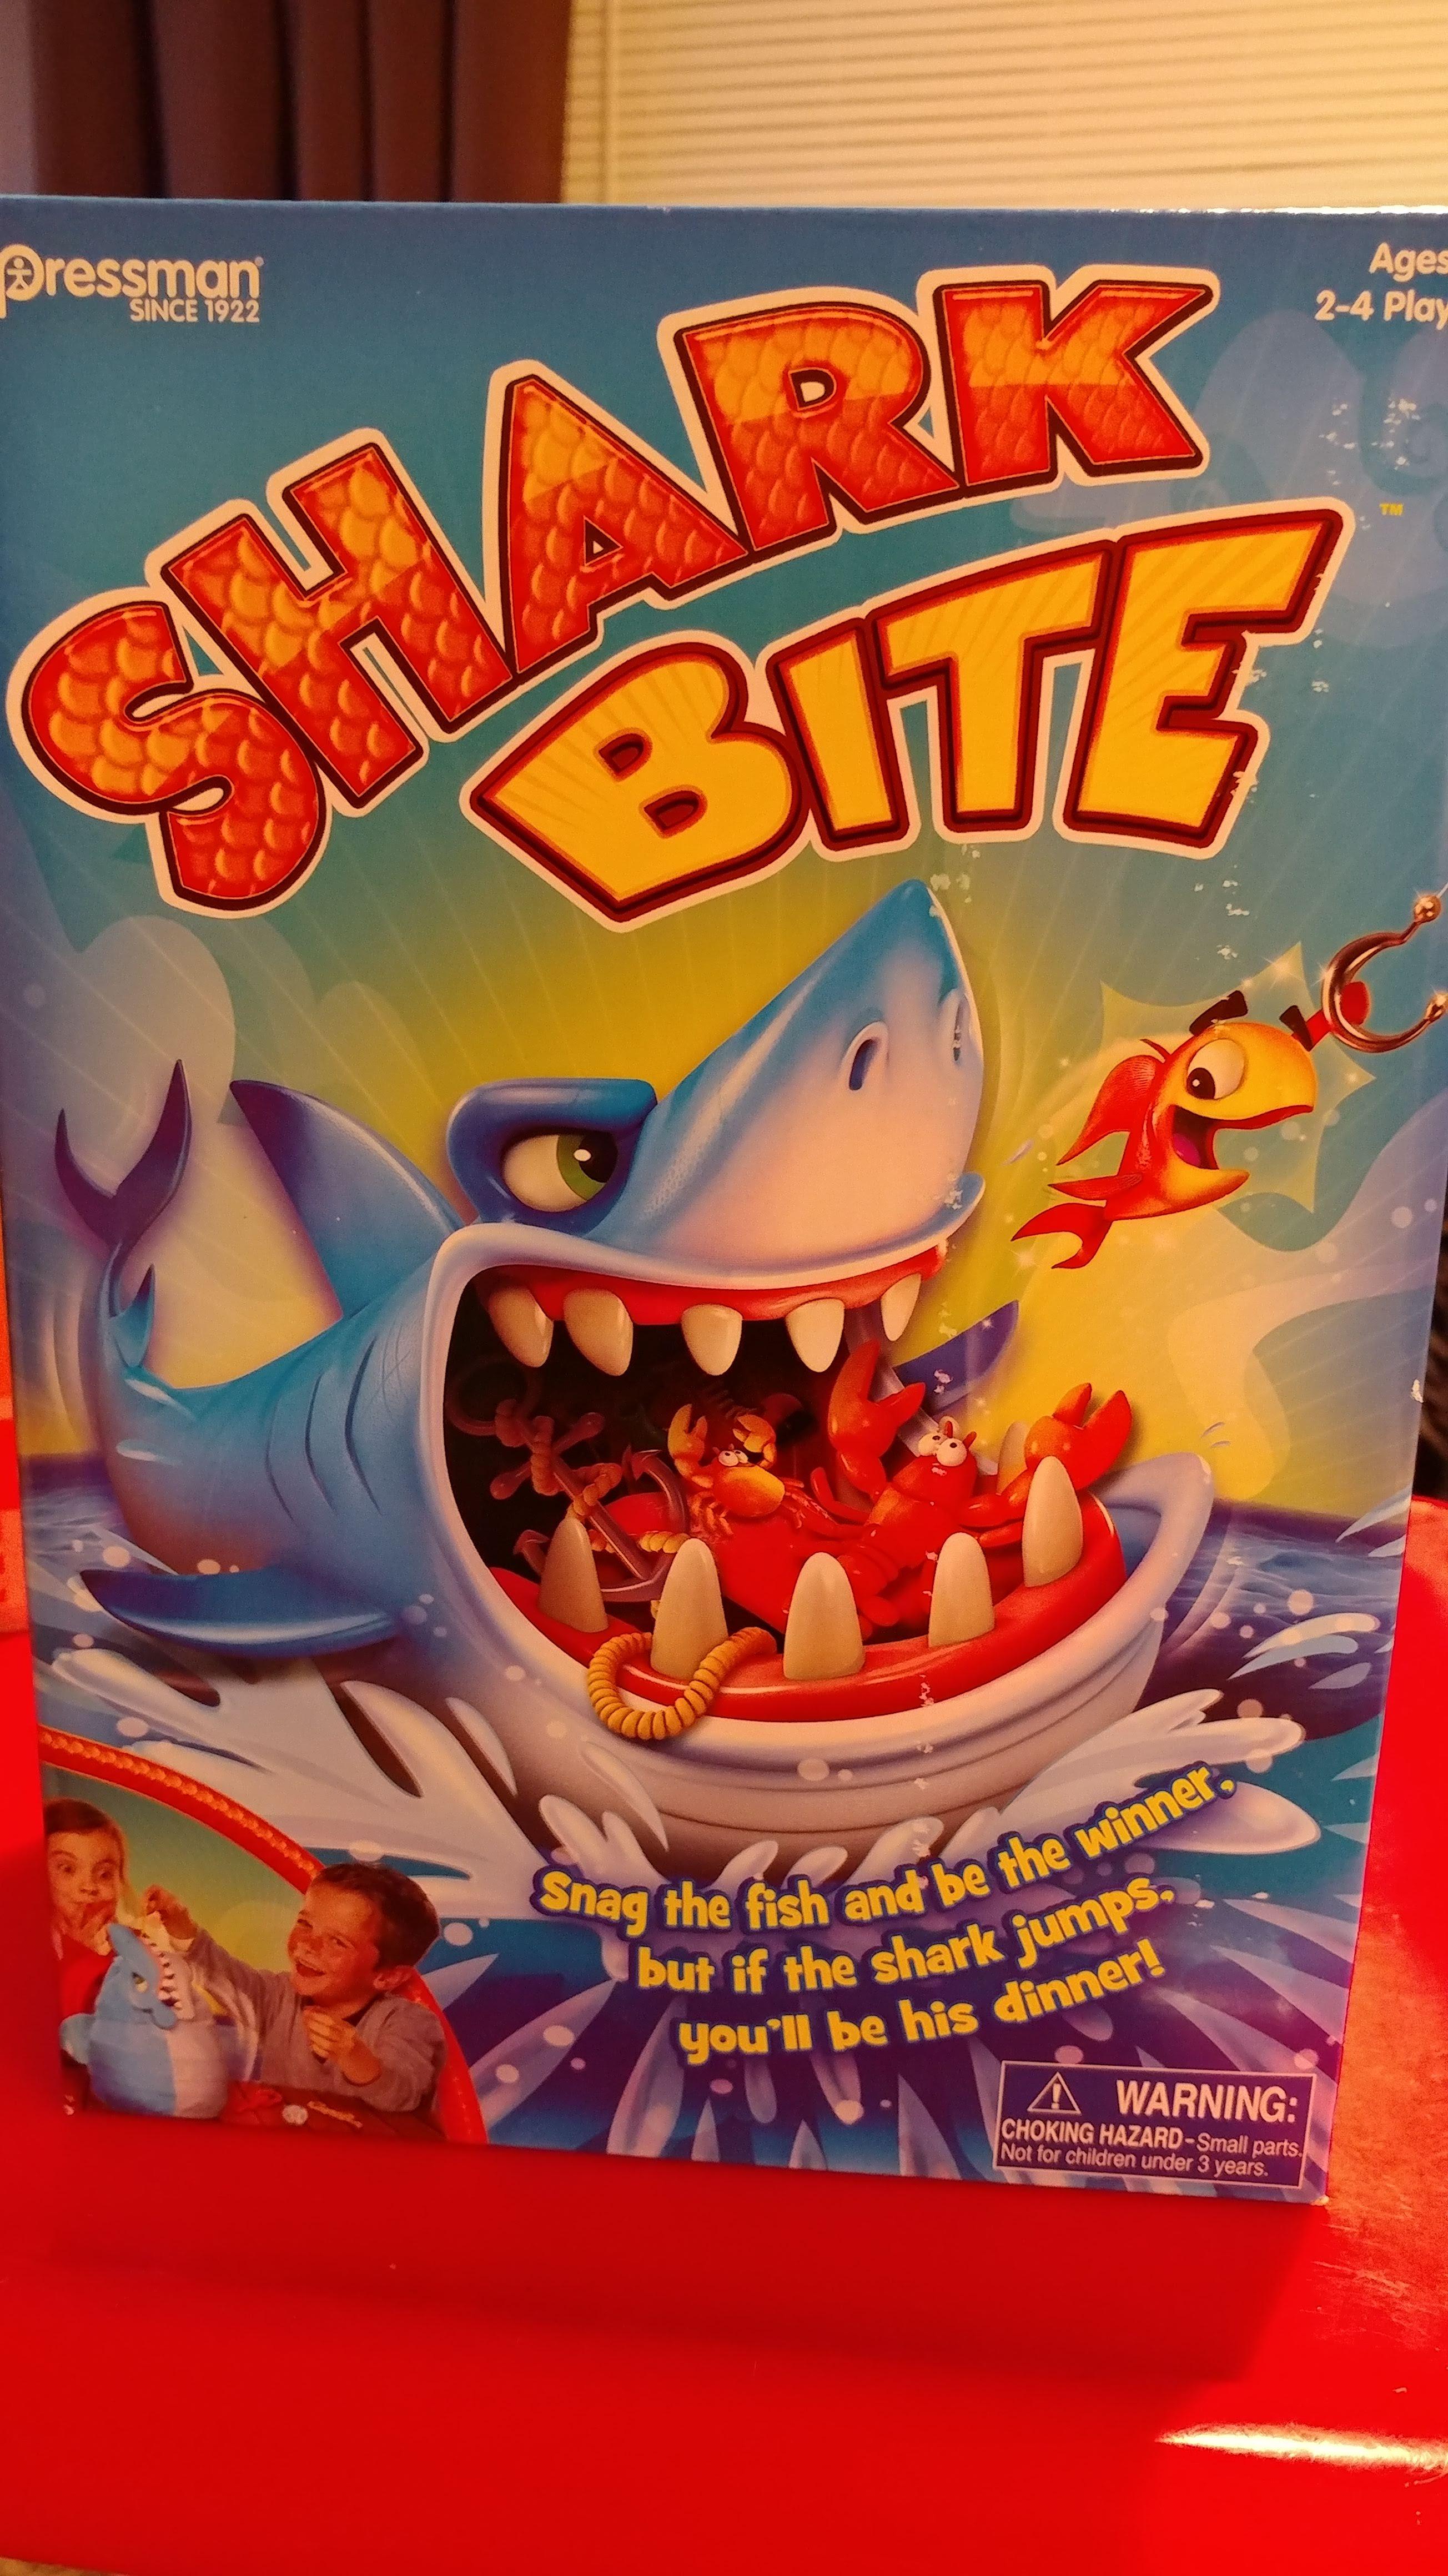 Shark Bite by Pressman Toy